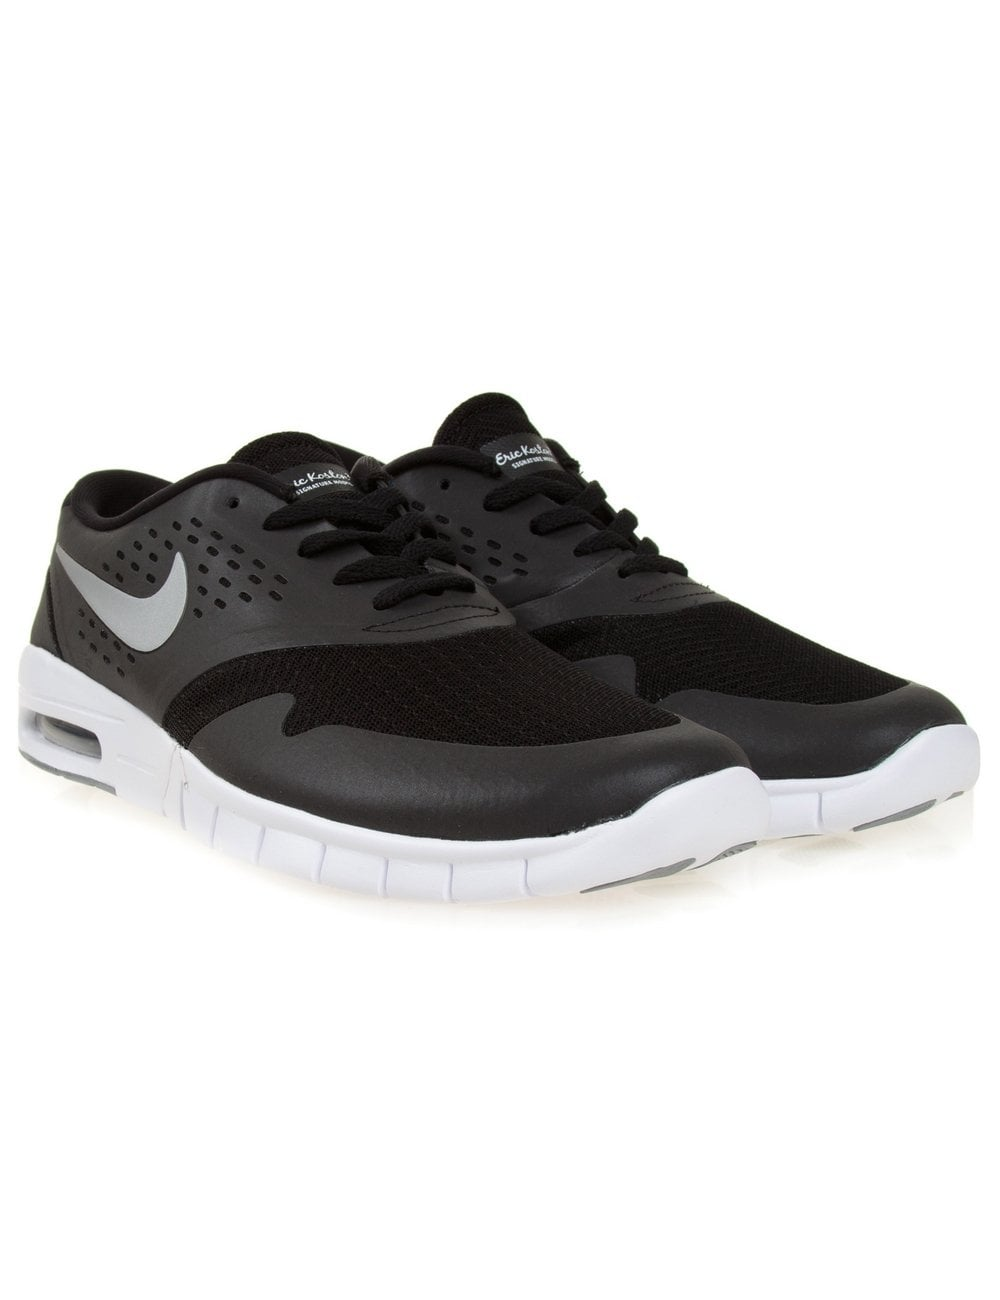 f9e0fd37510 Nike SB Eric Koston 2 Max - Black Metallic - Footwear from Fat ...